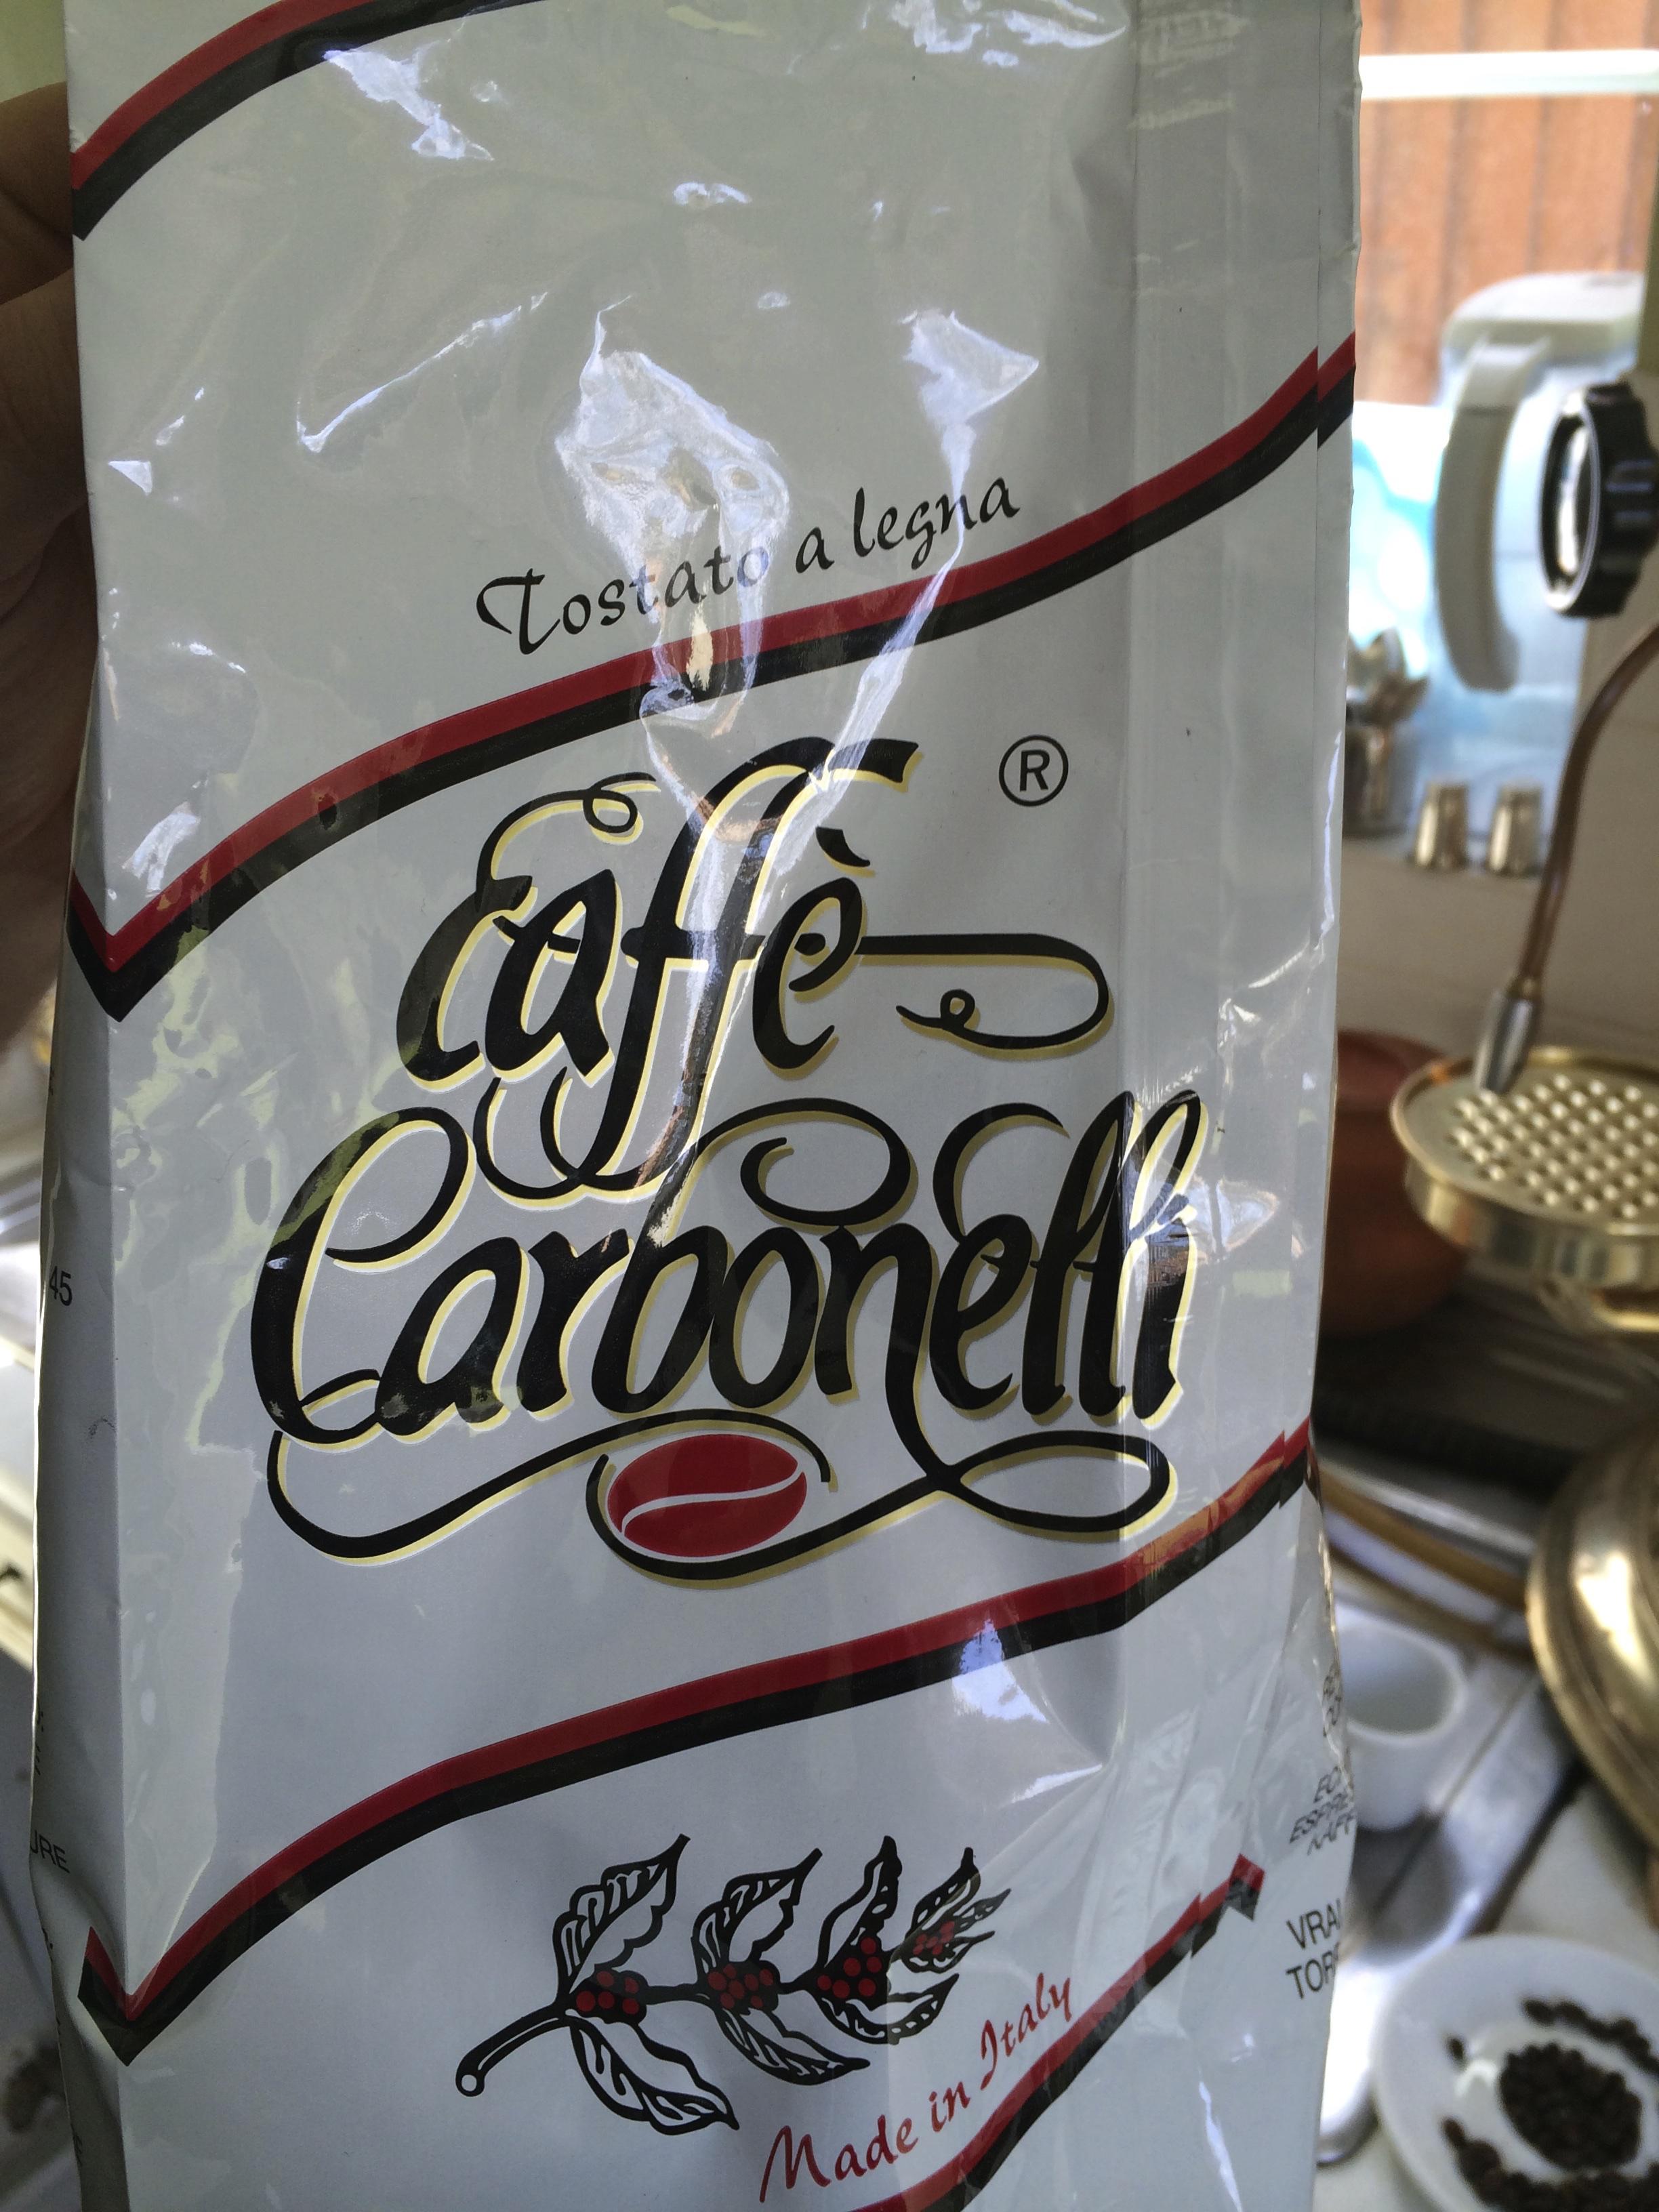 Caffe Carbonelli beans